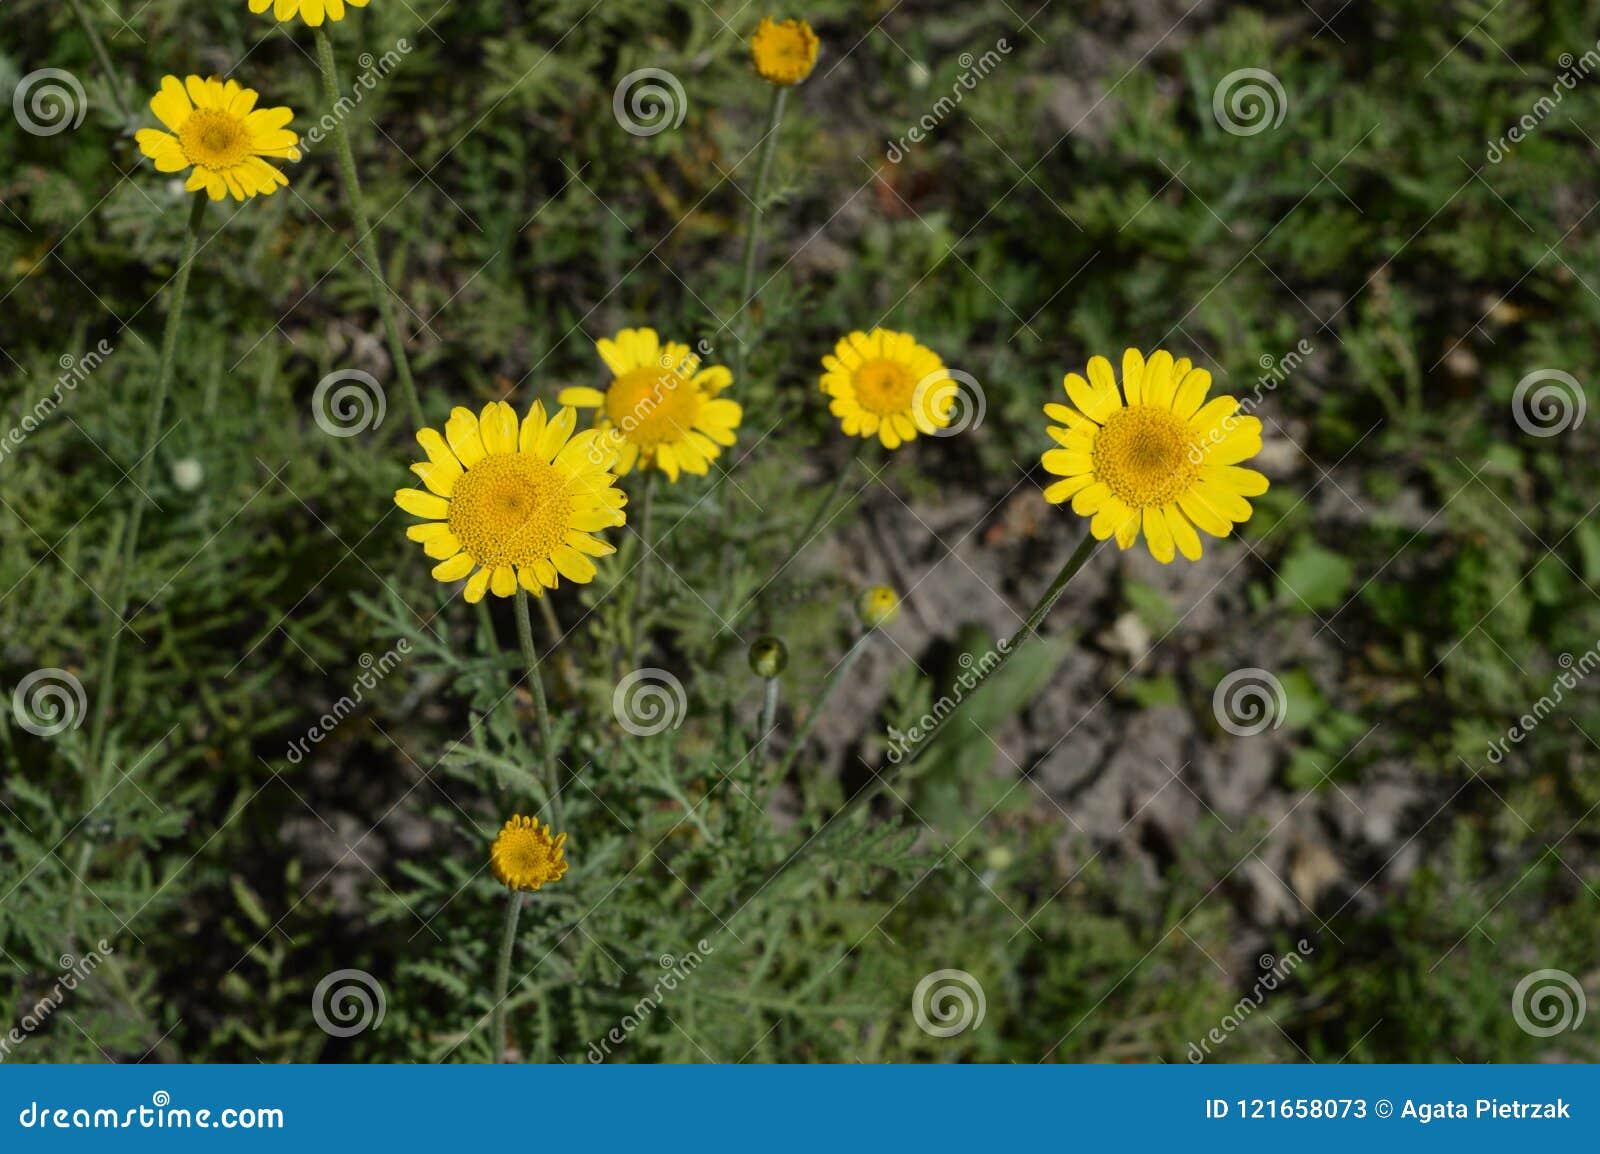 Yellow Loosestrife Like Yellow Daisy Stock Image Image Of Feathery